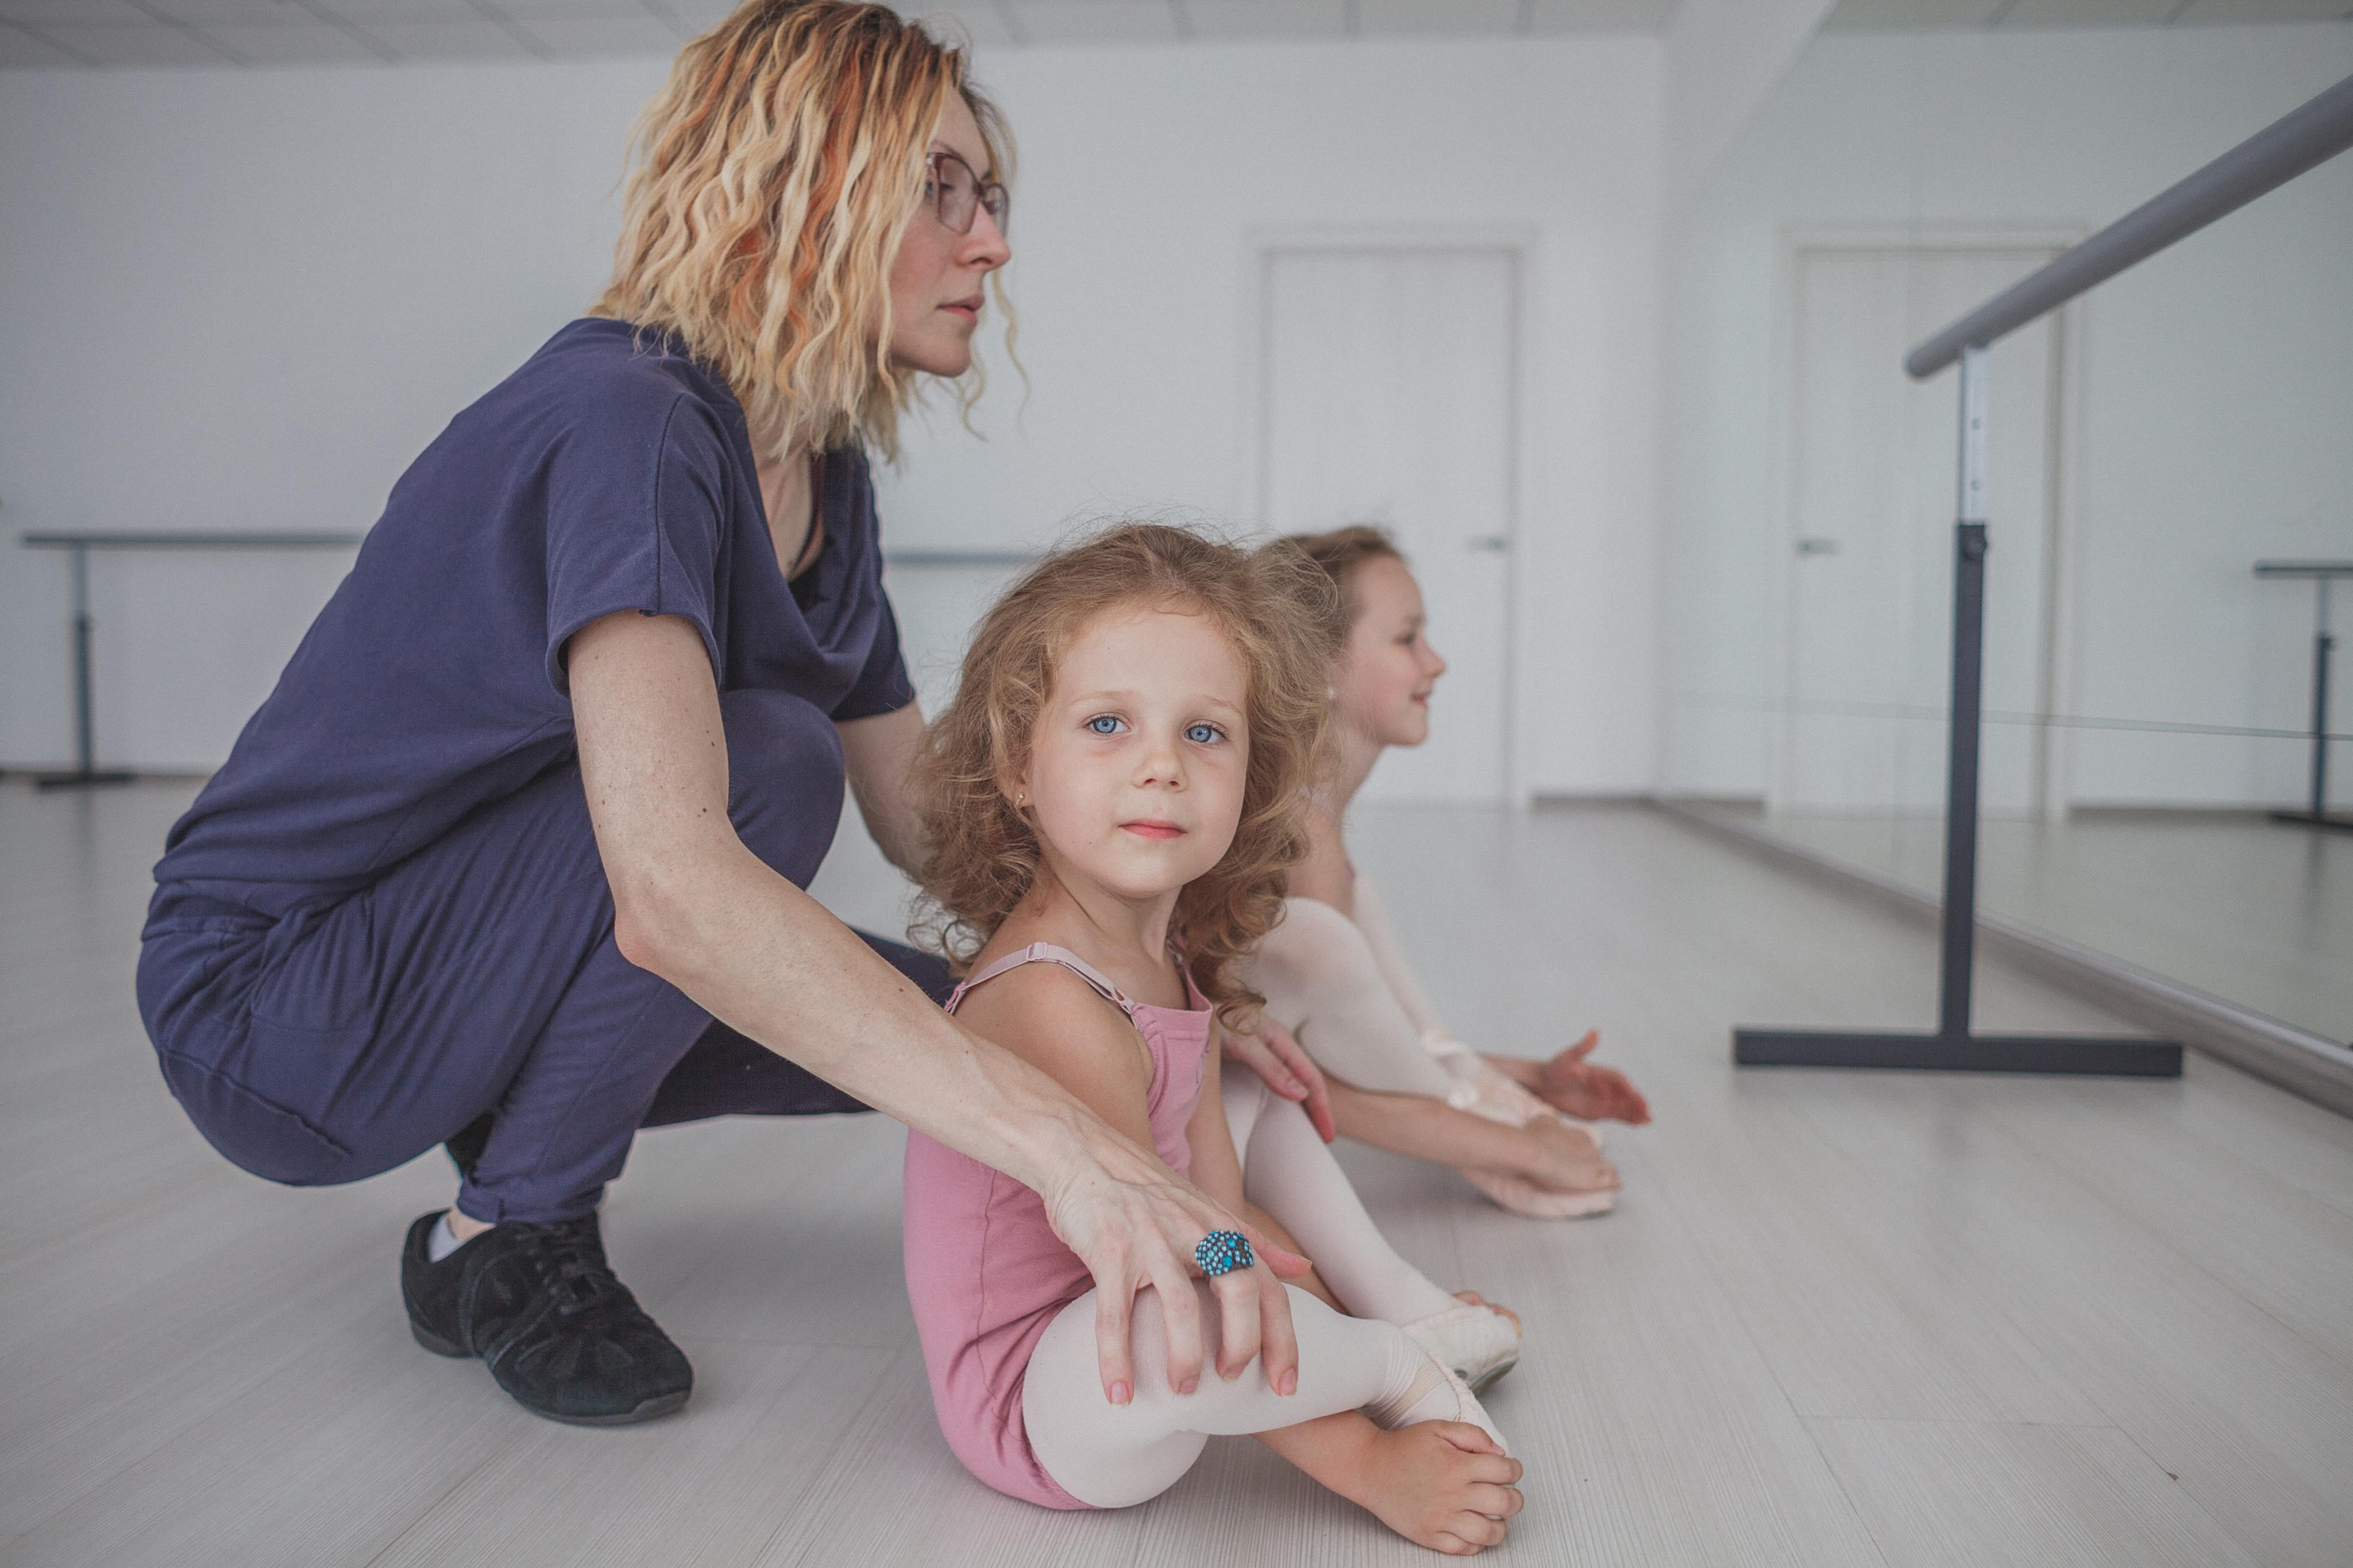 Анастасия на занятиях с малышами. Фото: А. Коваленко